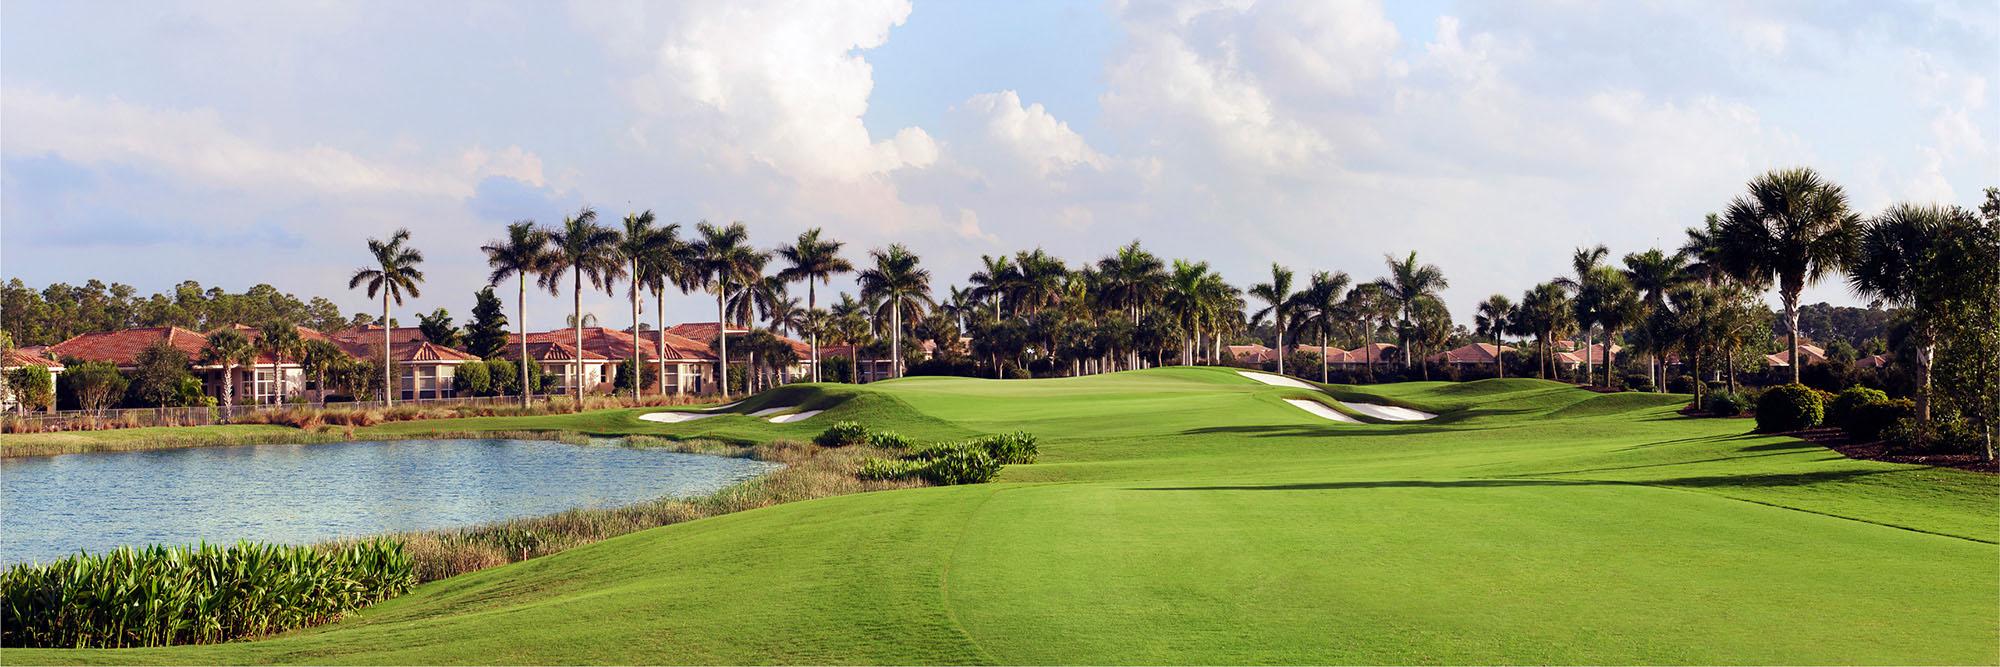 Golf Course Image - Mirasol Sunrise No. 3